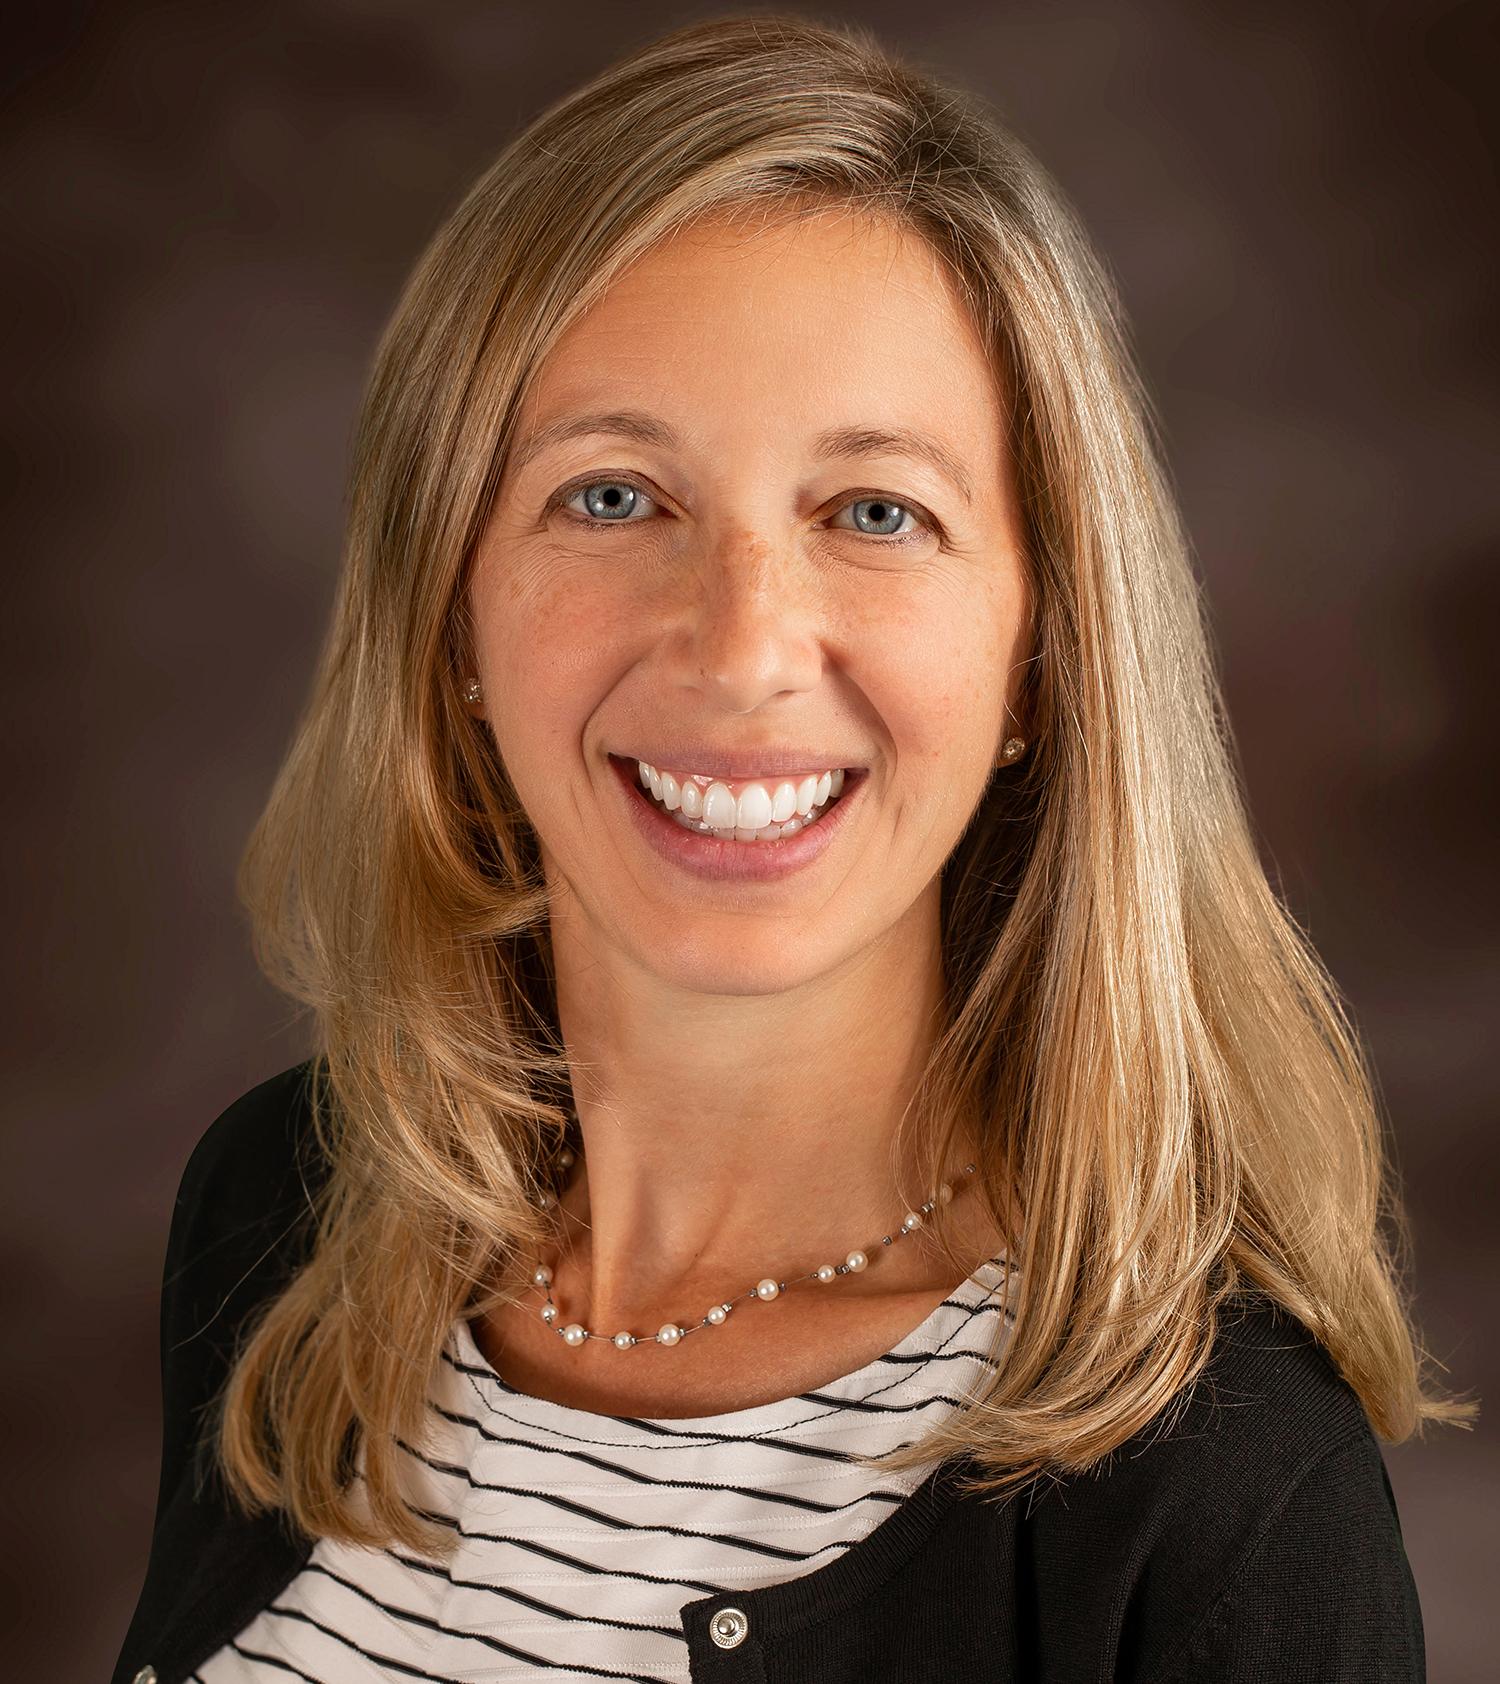 Dr. Courtney Virgilio